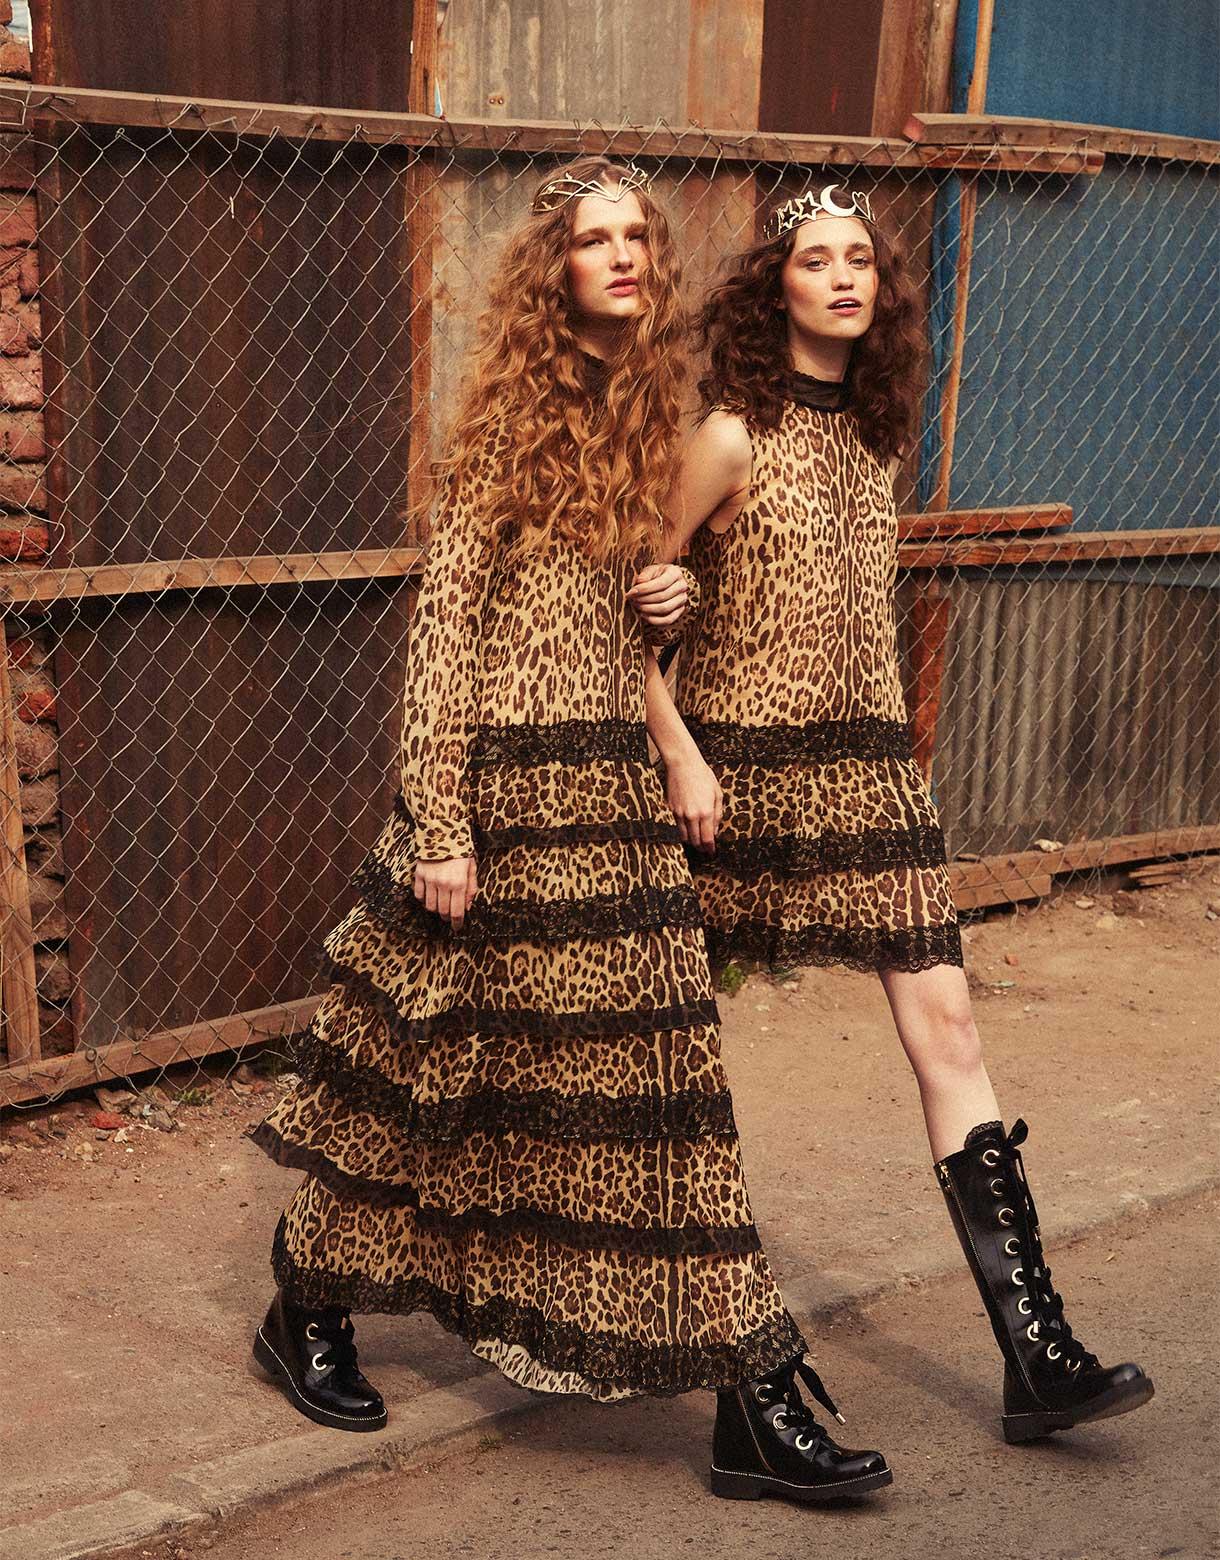 Model Dorina Female New Face Vogue Mexico Fifth Models Barcelona Agency